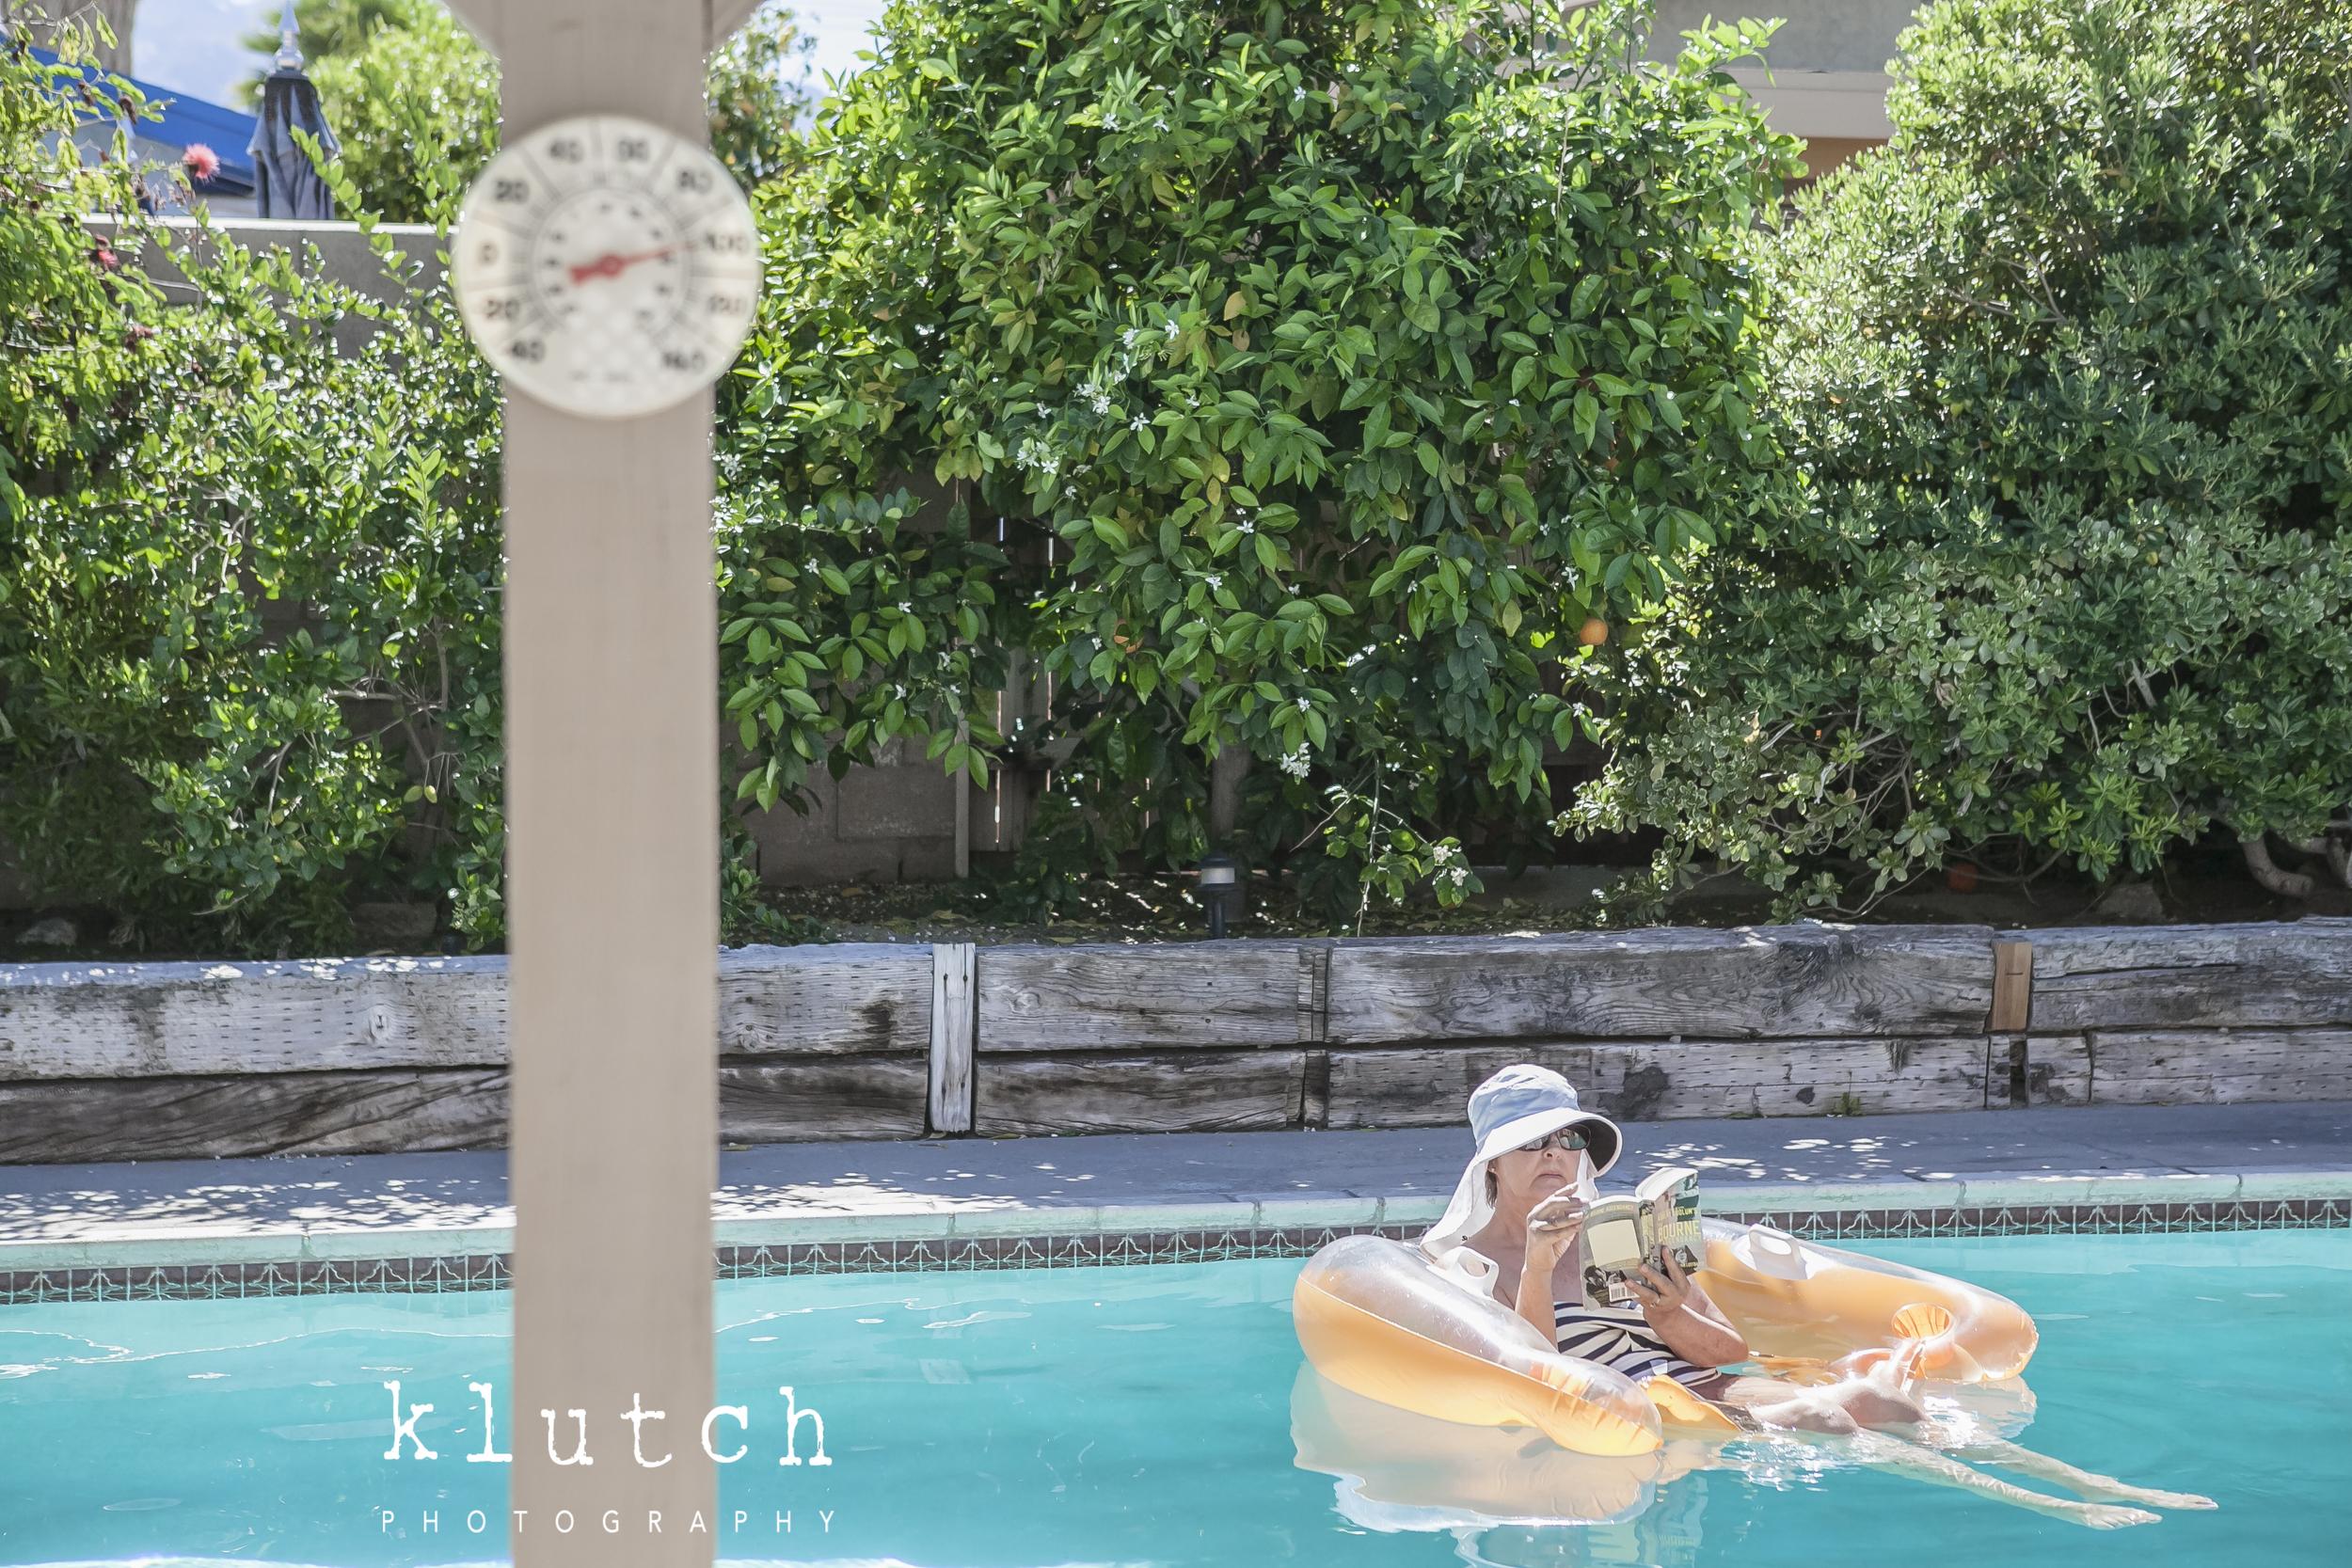 Klutch Photography,white rock family photographer, vancouver family photographer, whiterock lifestyle photographer, life unscripted photographer, life unscripted session, photography,Dina Ferreira Stoddard-0187.jpg